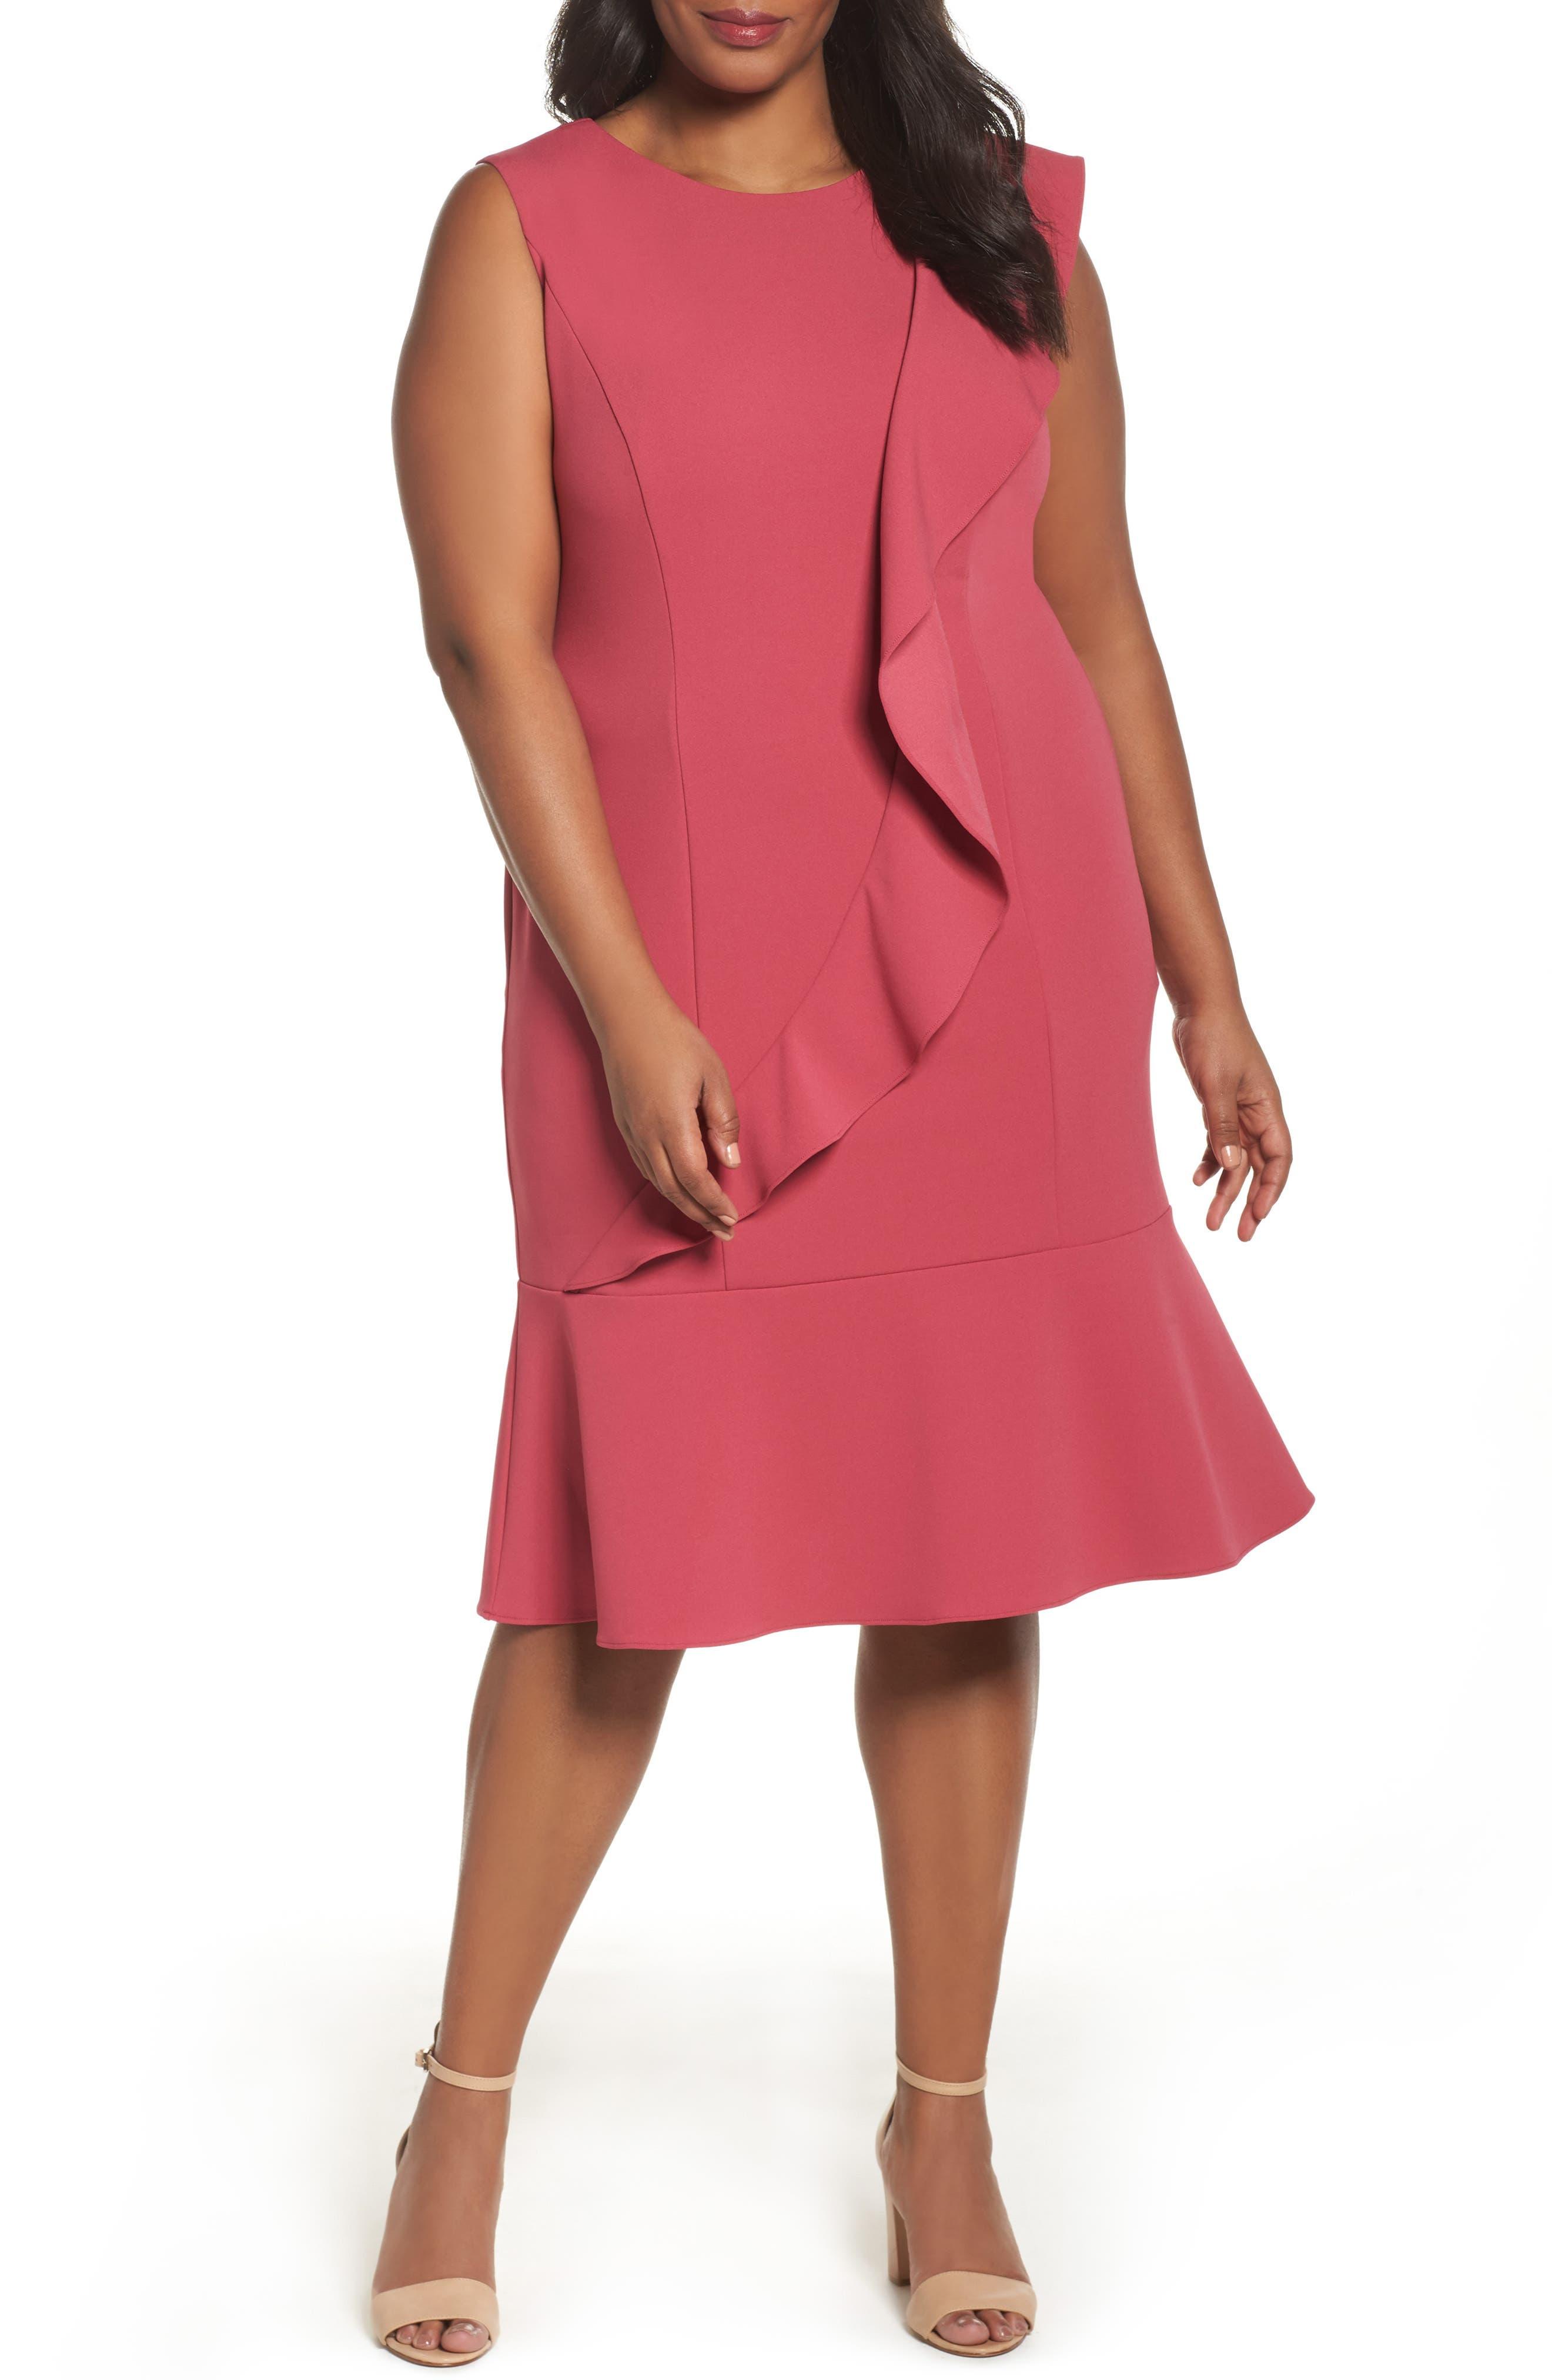 Main Image - Adrianna Papell Knit Crepe Drop Waist Dress (Plus Size)